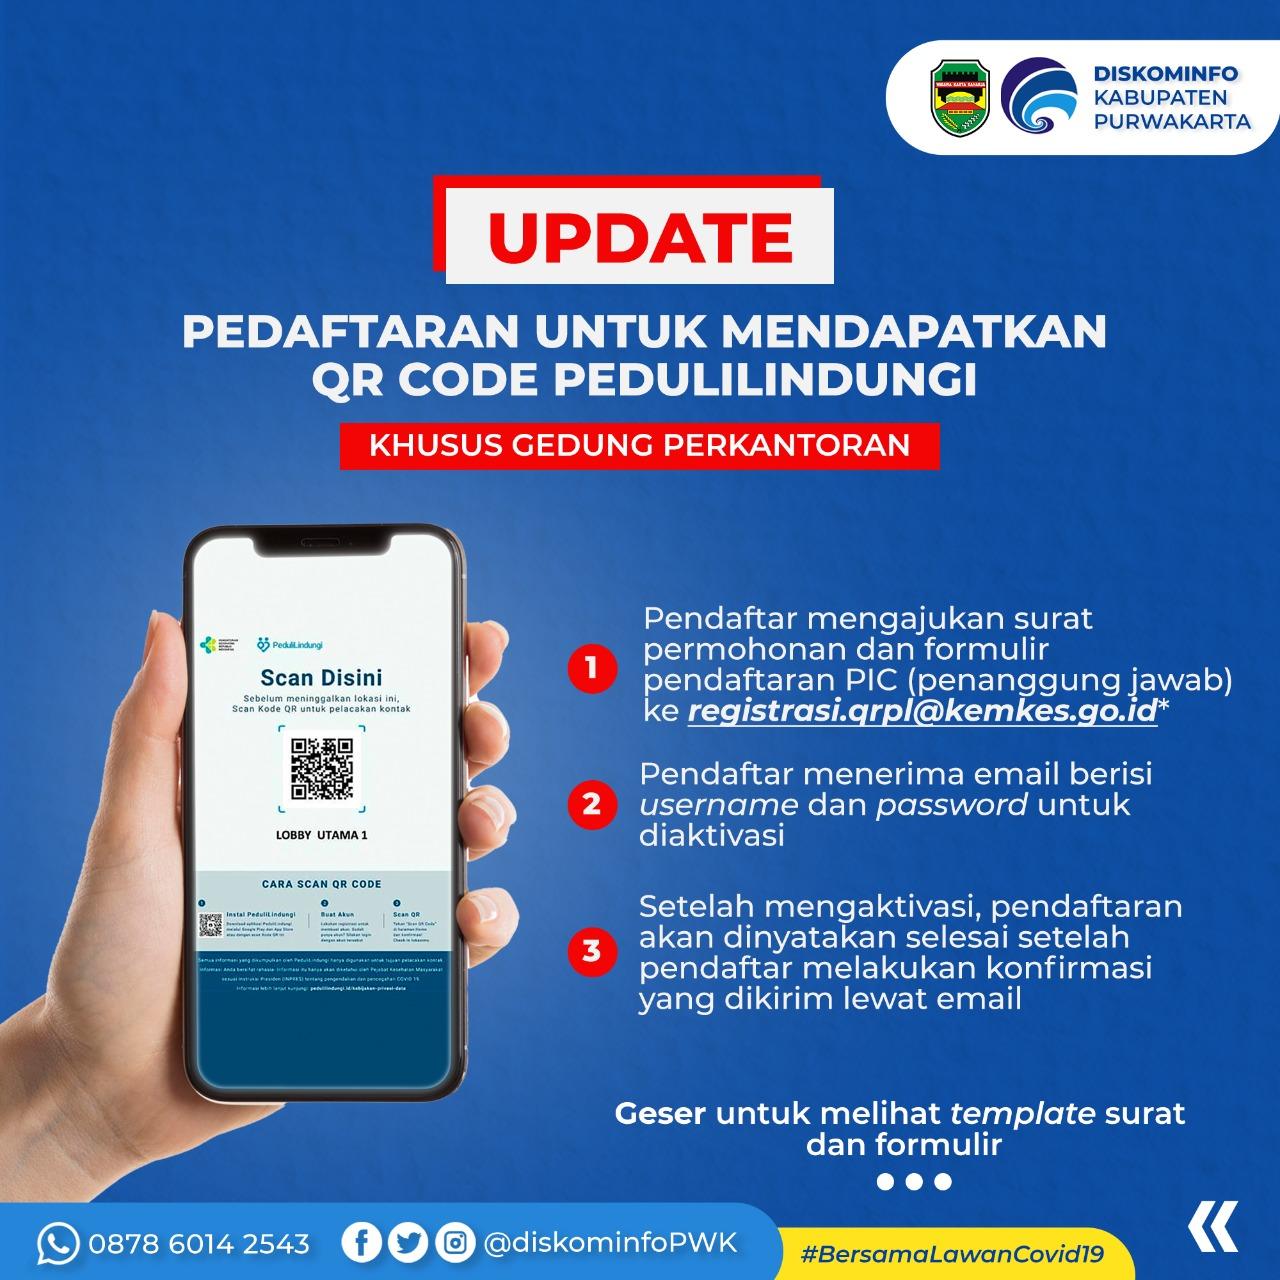 Update Pedaftaran untuk Mendapatkan QR Code PeduliLindungi